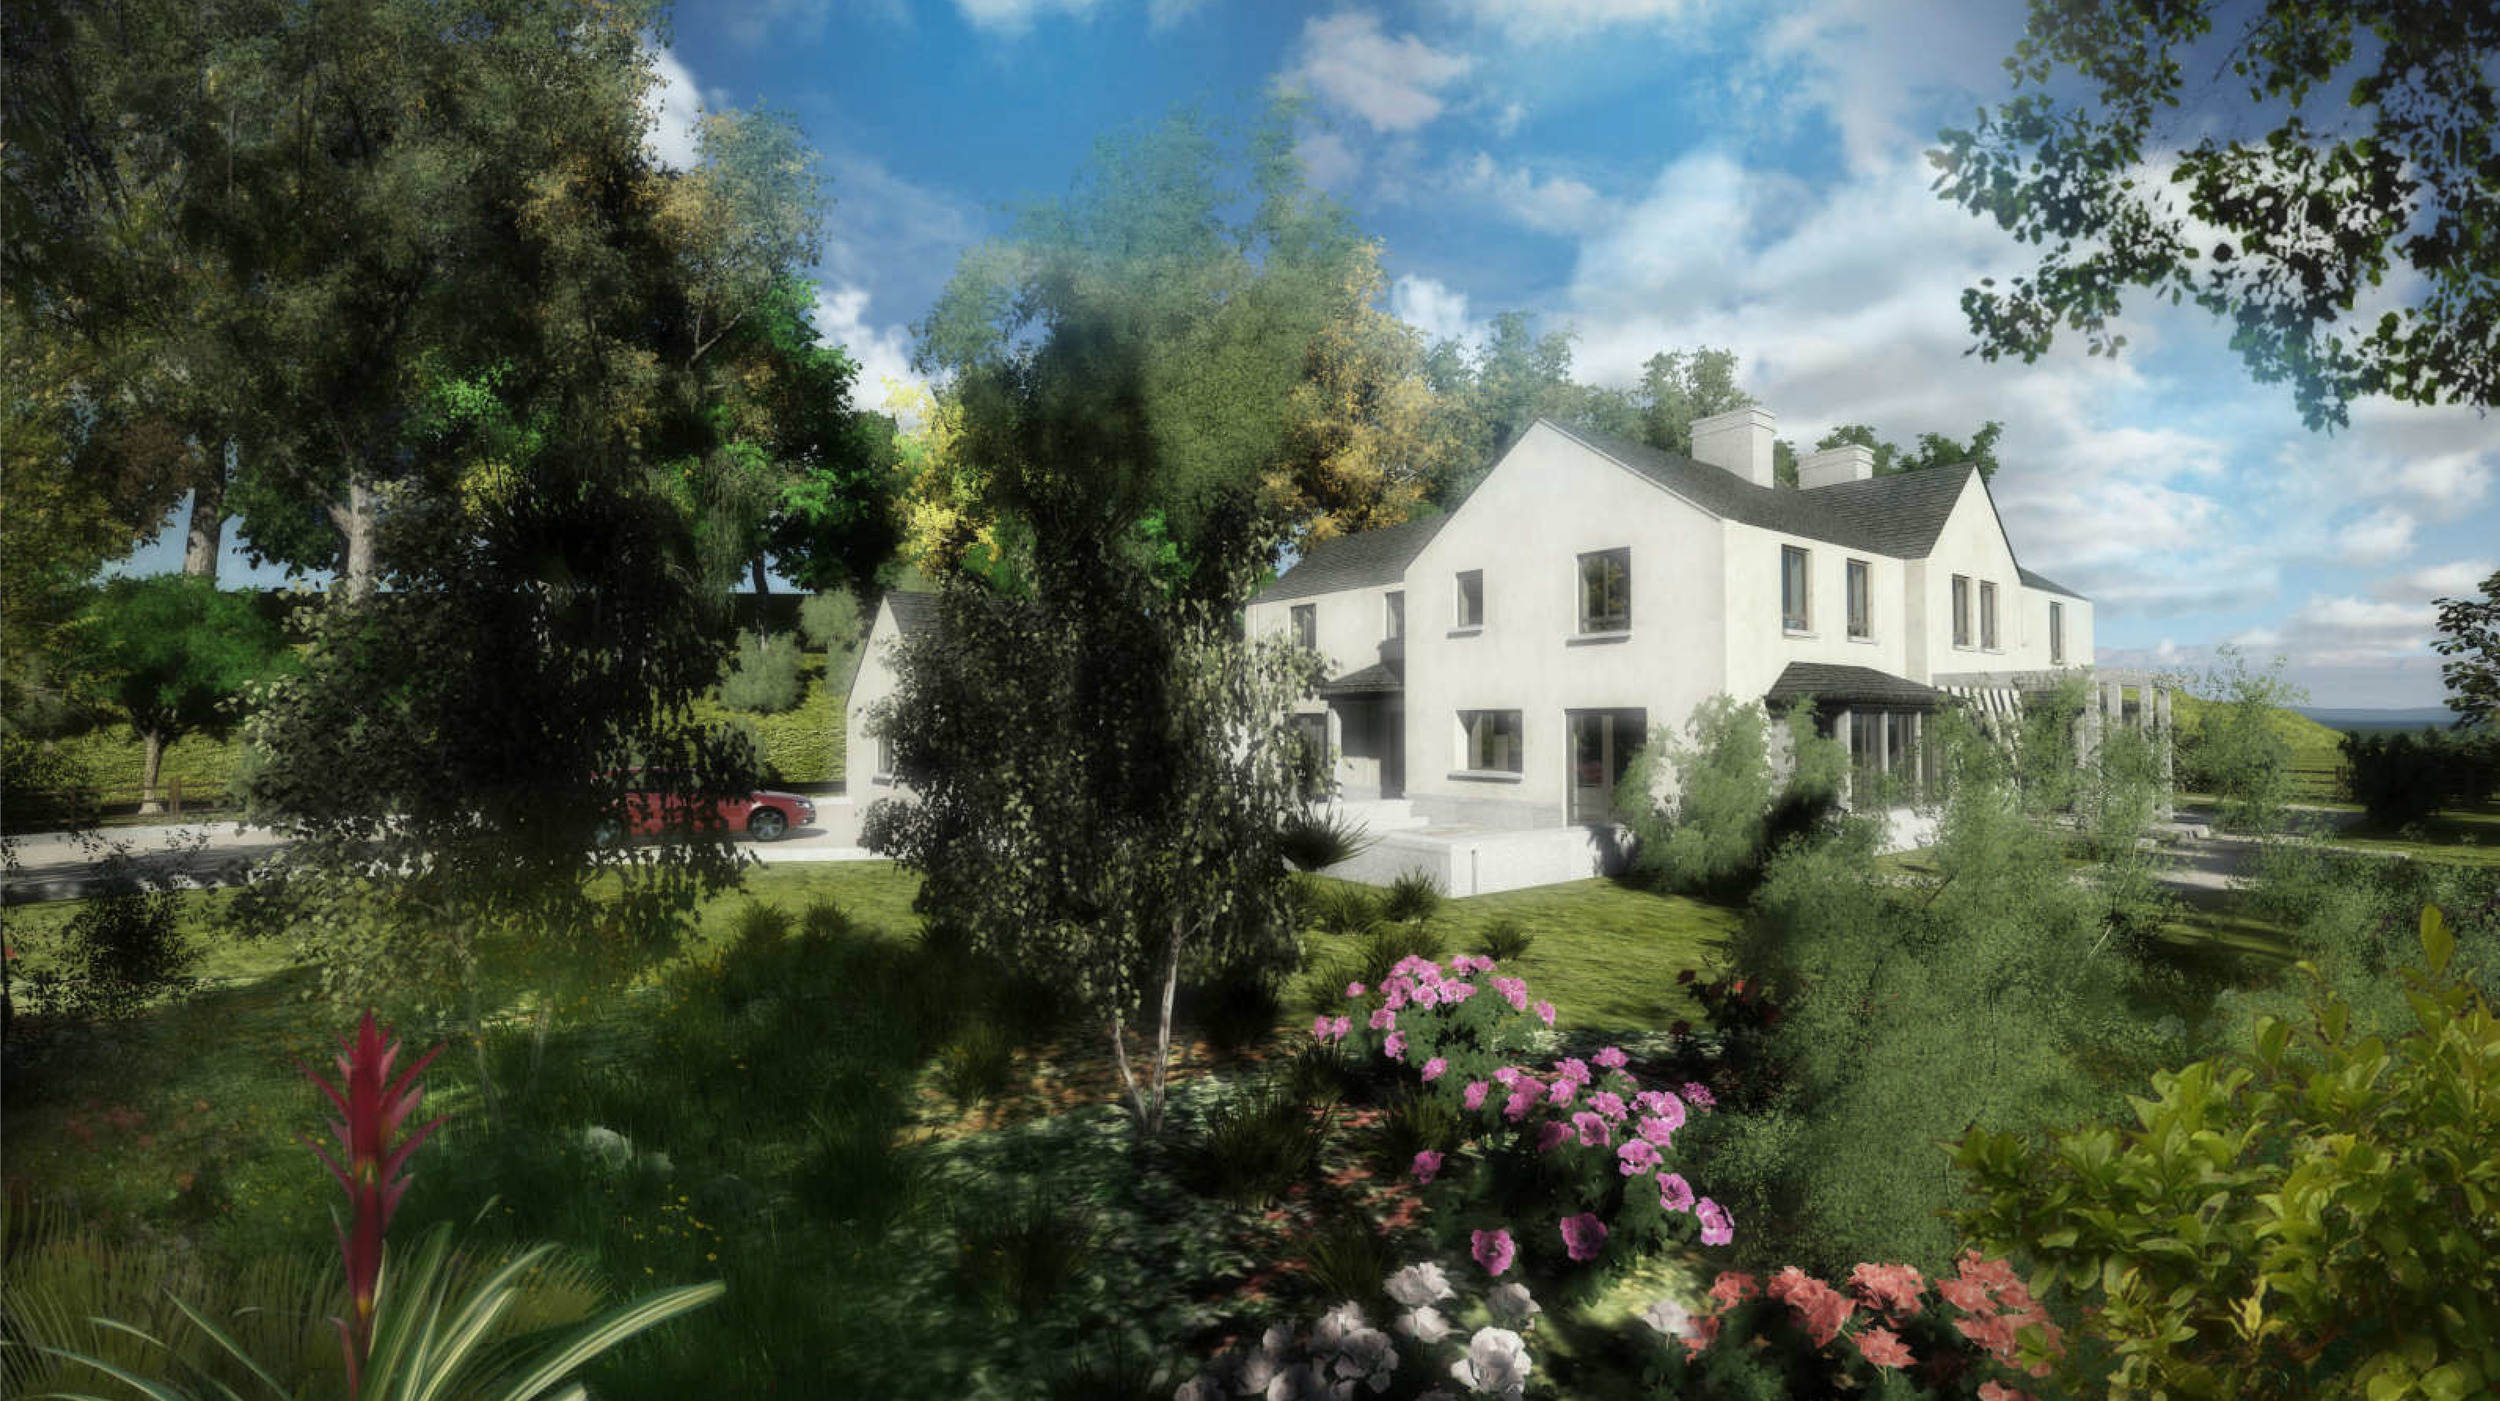 New_House_Design_Architect_Dublin_RIAI_Bespoke_Rural_03.jpg